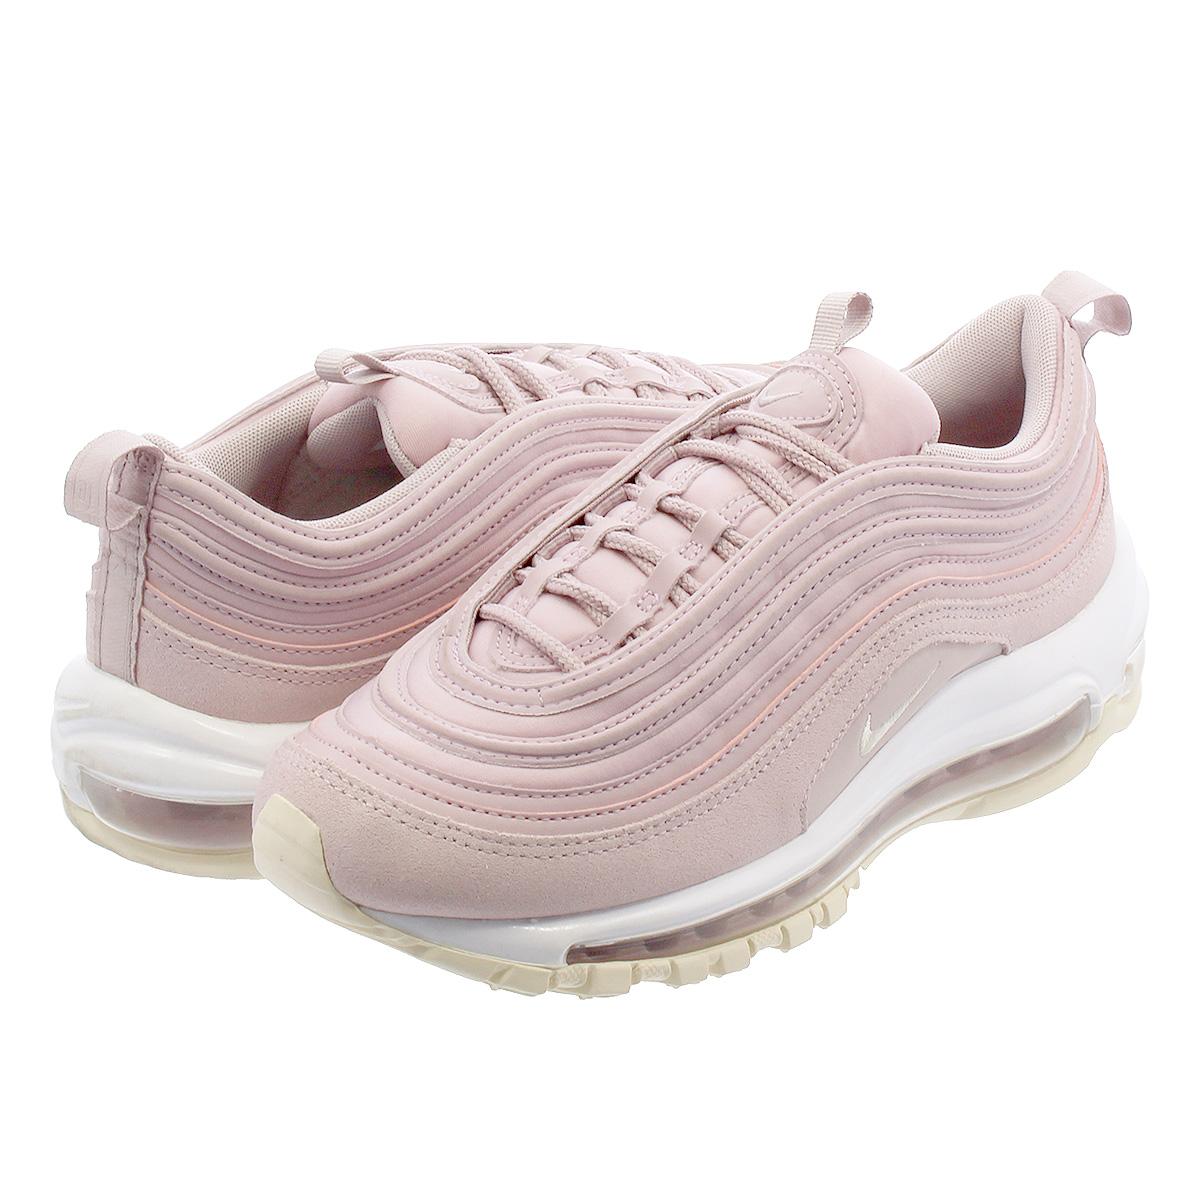 air max 97 cream and pink